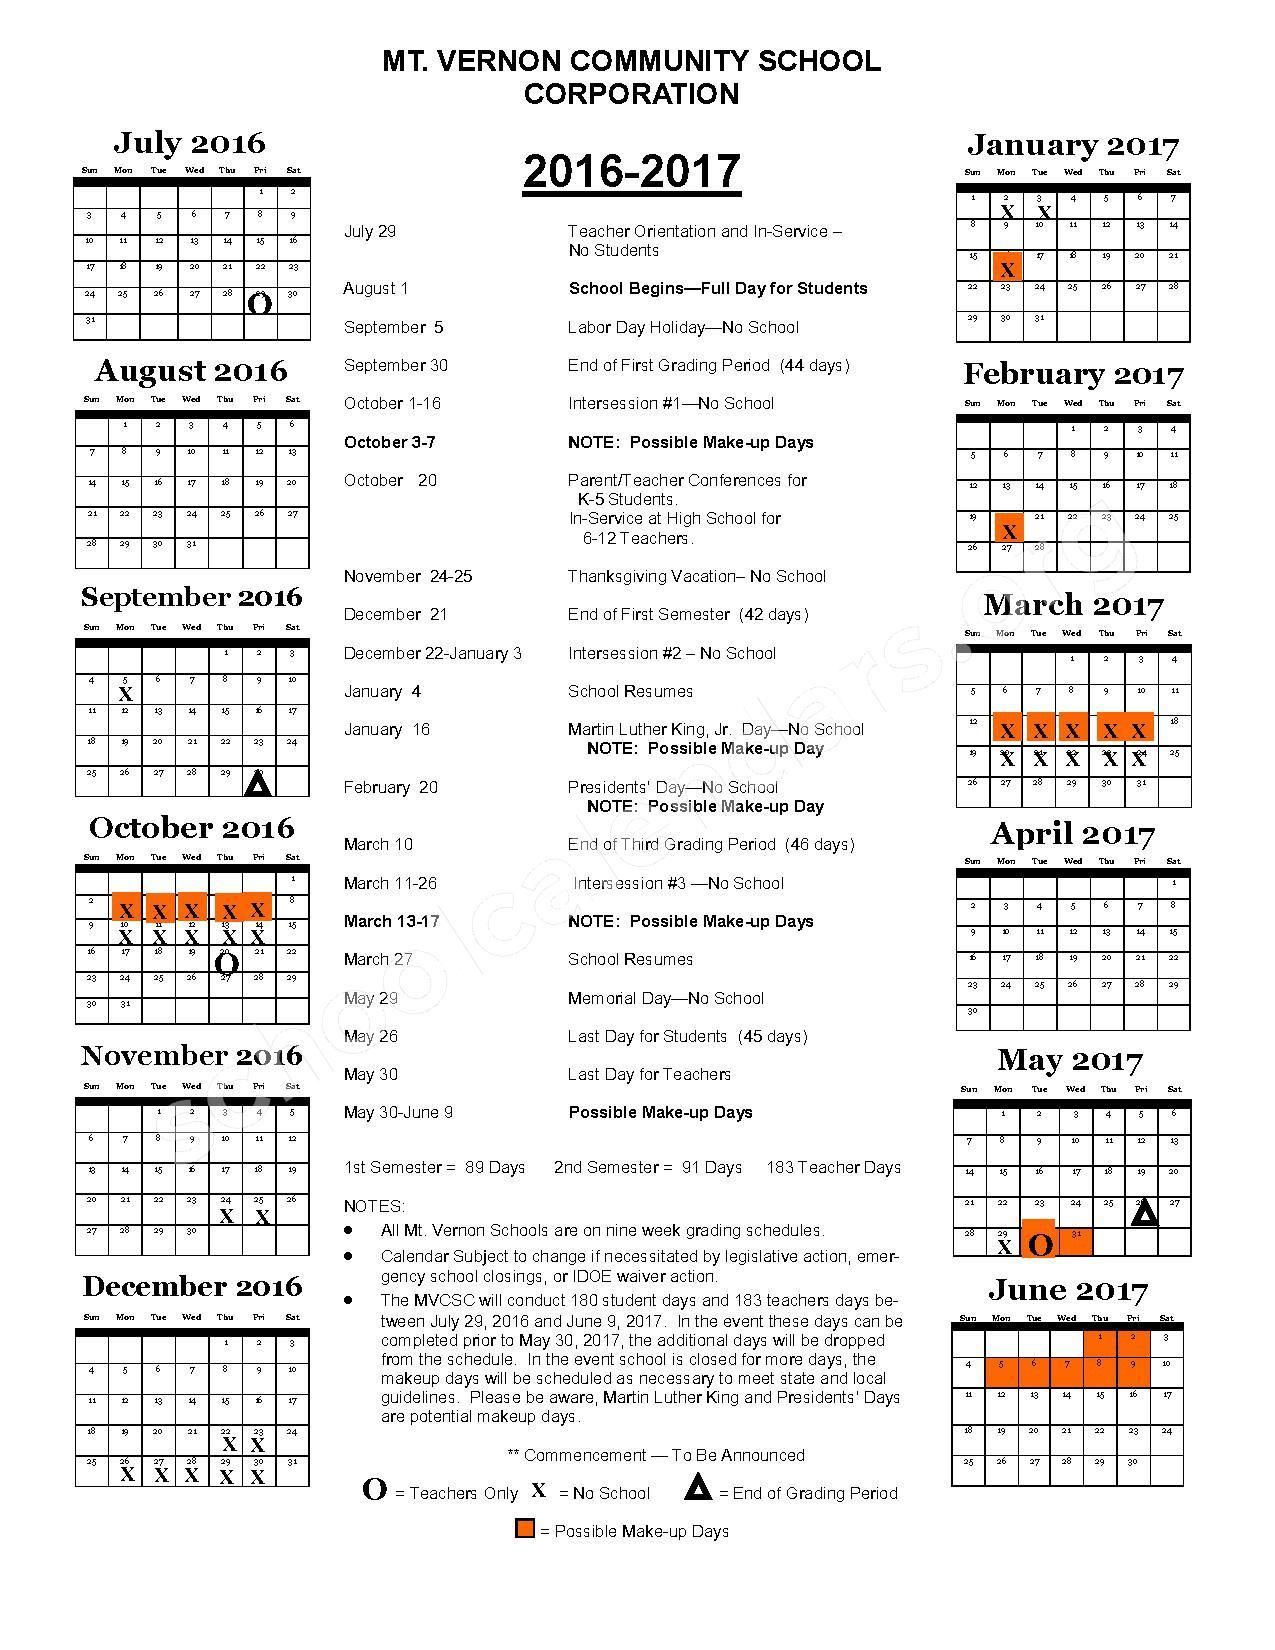 District Calendar – Mt Vernon Community School Corporation – page 1